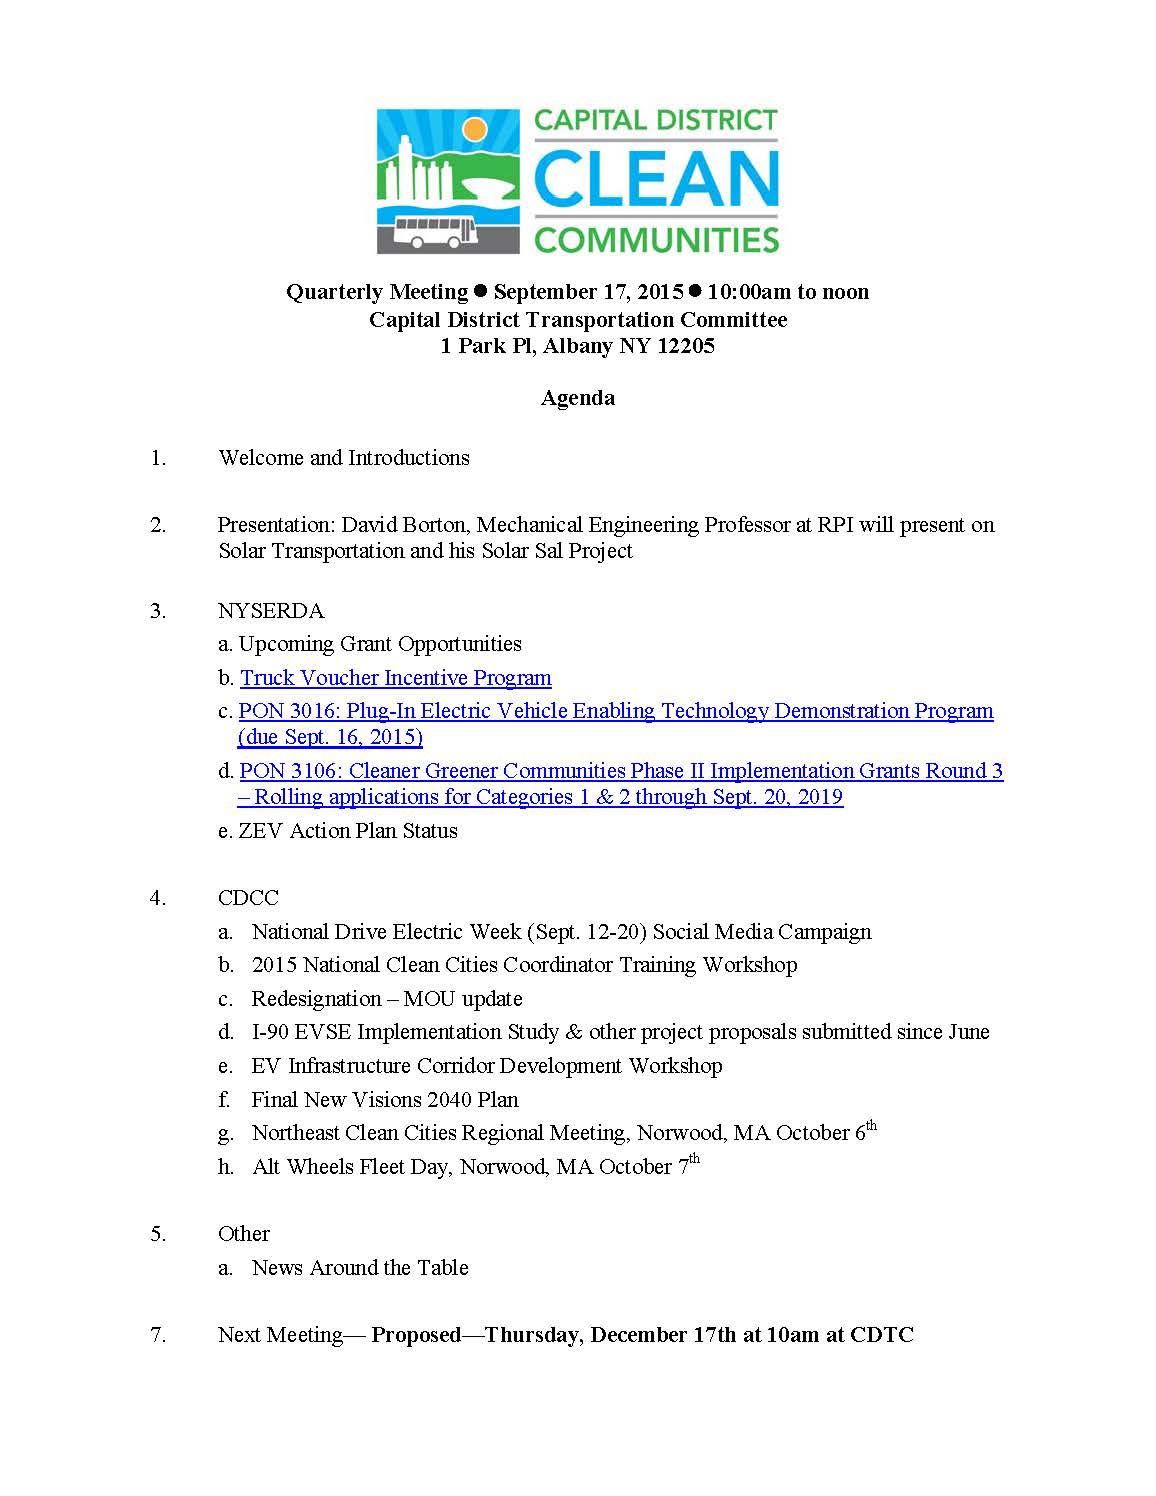 agenda9-17-15_Page_1